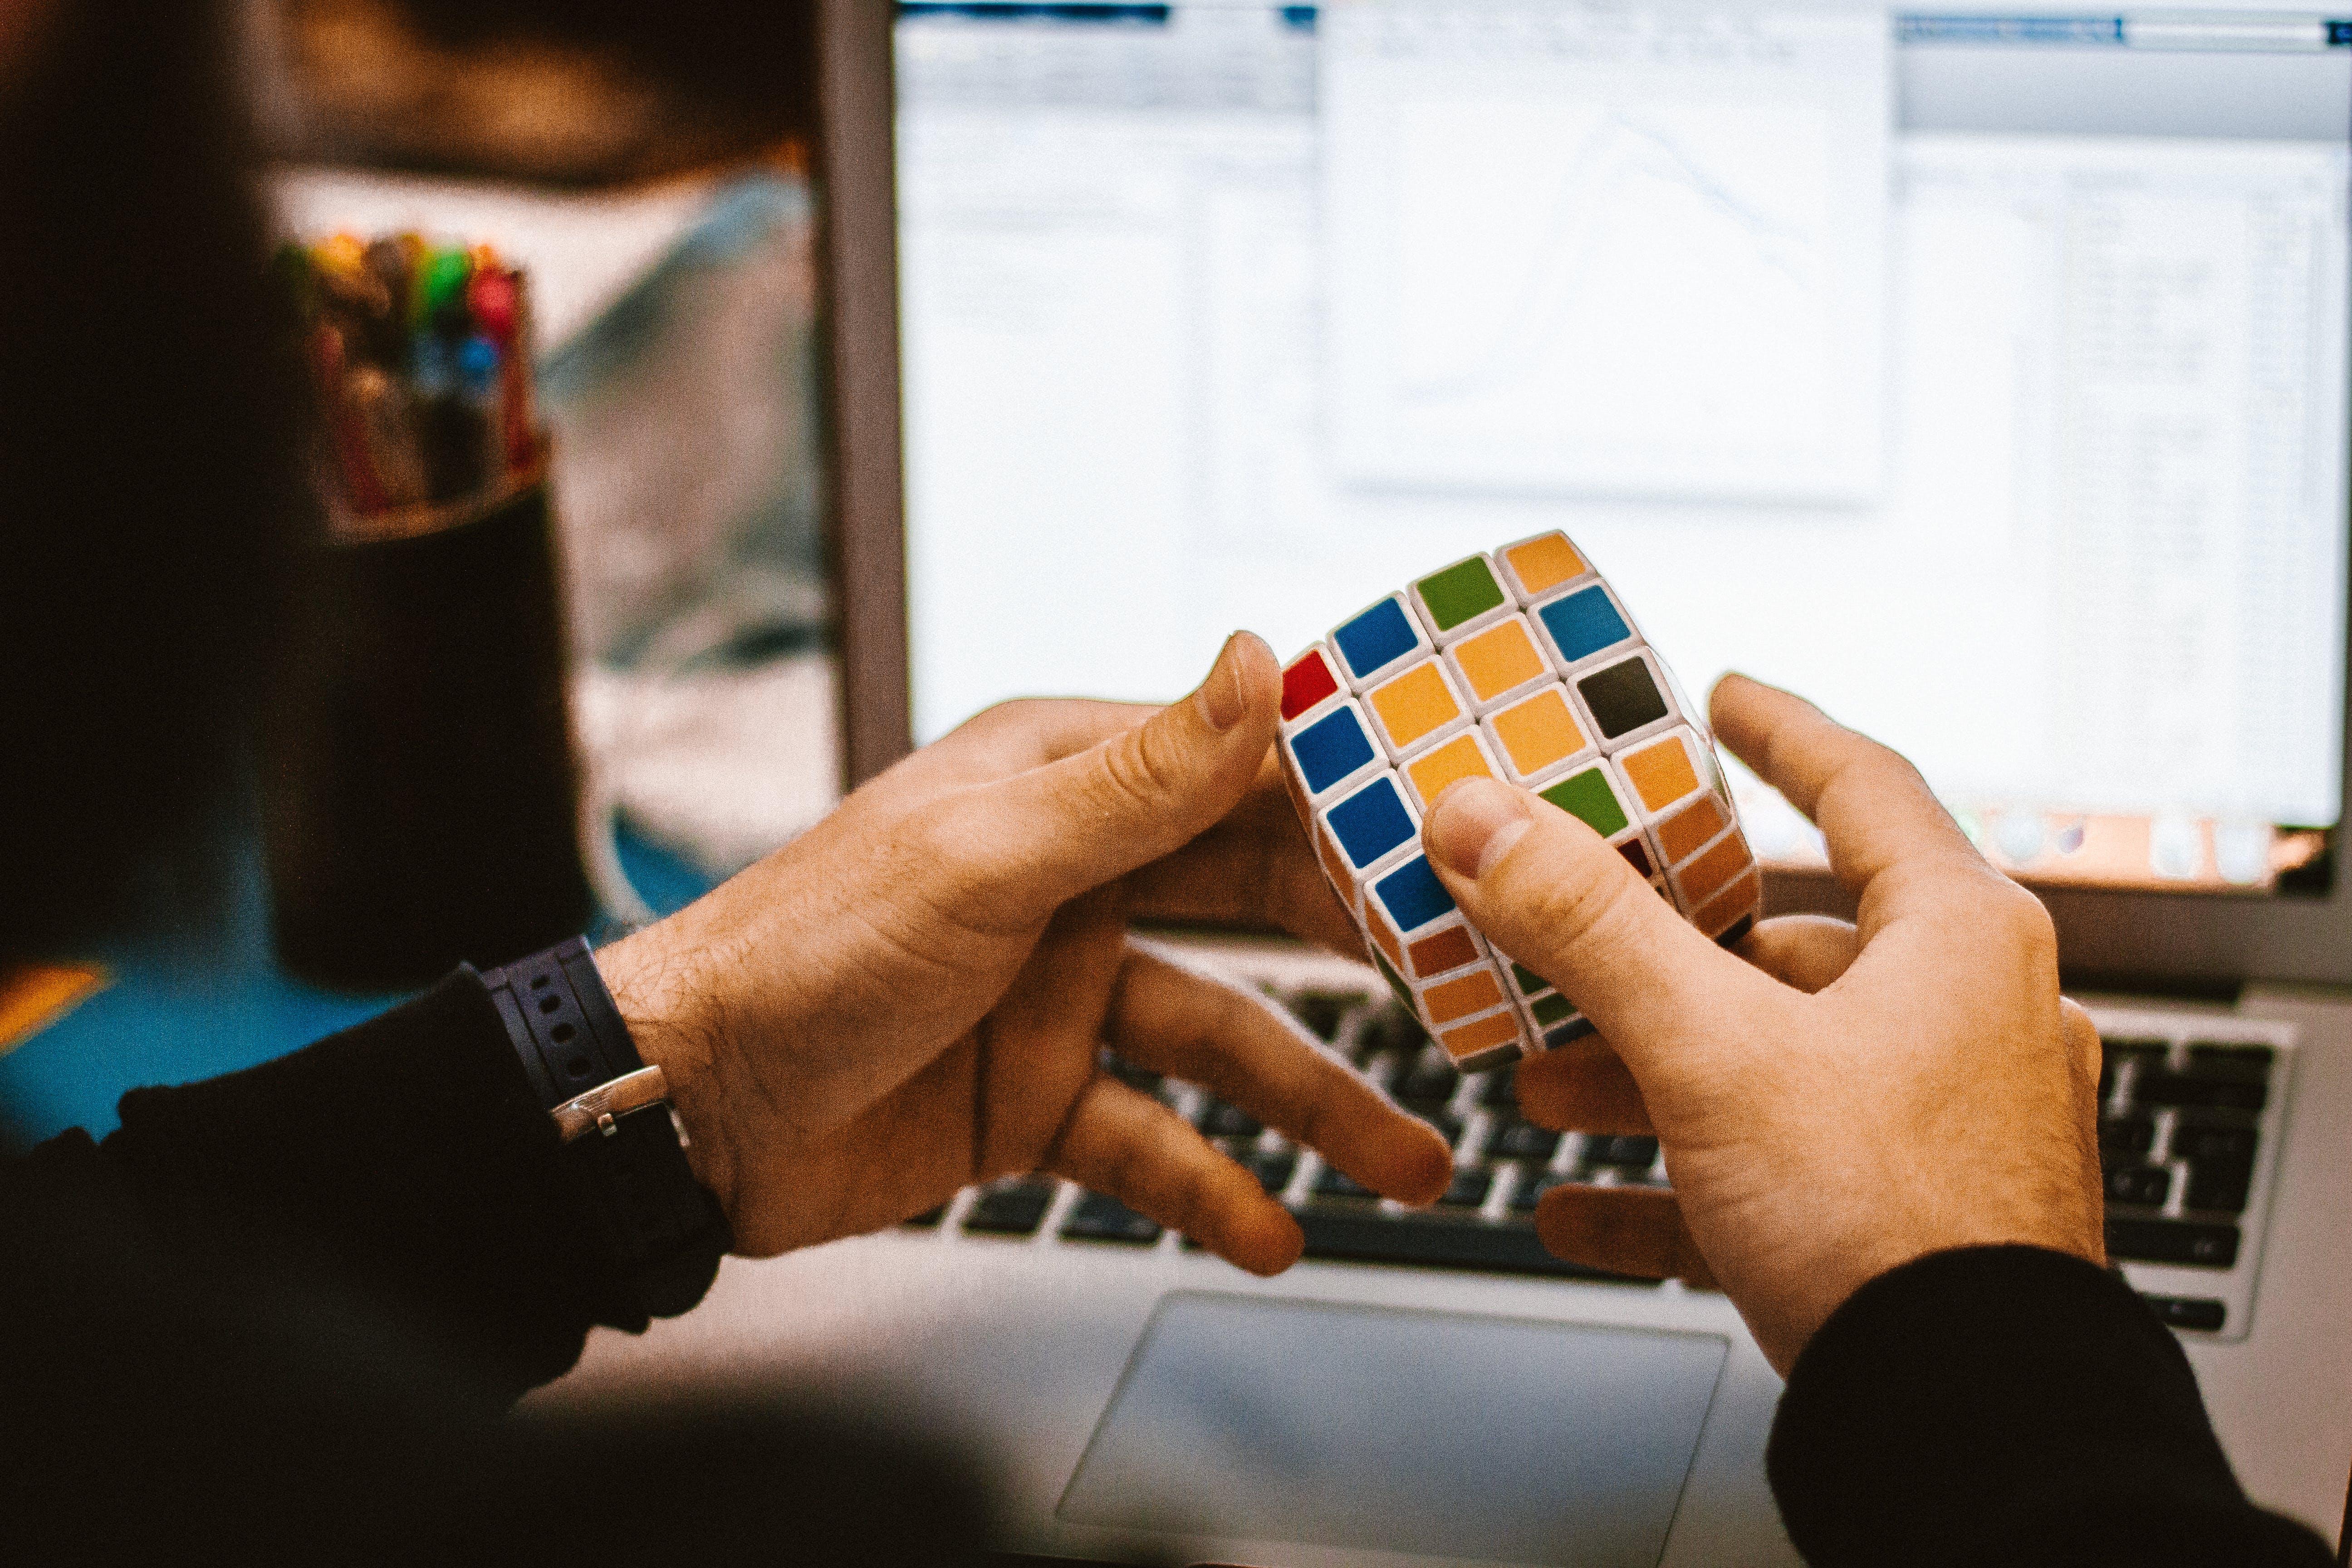 4x4 Rubik's Cube on a Man's Hand